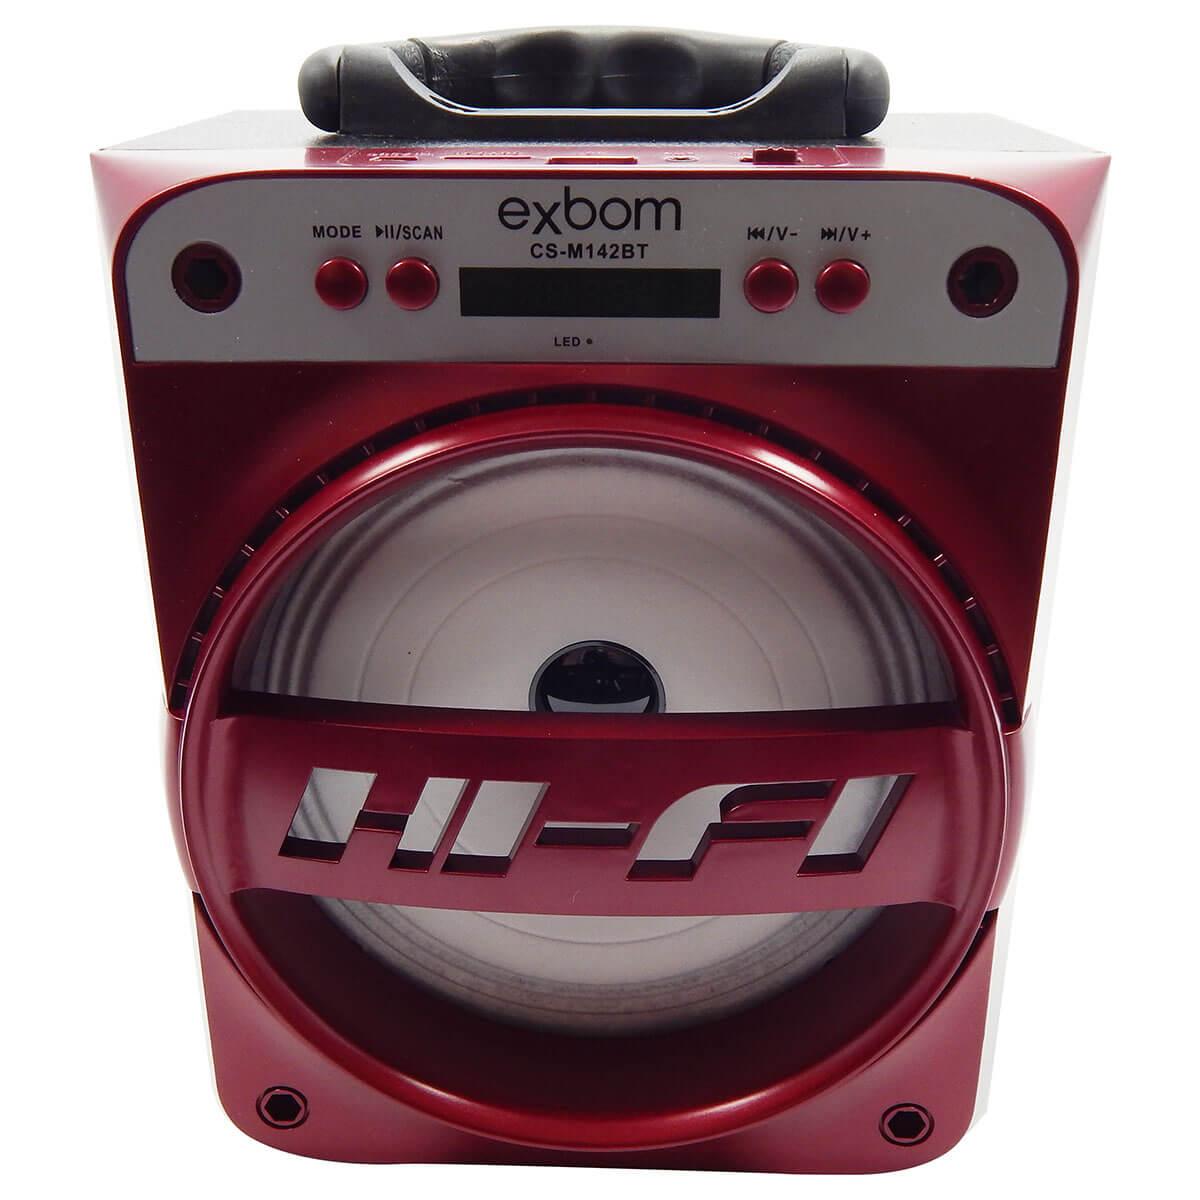 Caixa de Som 2.0 15 Watts Rms Bateria/Radio/SD/USB/Aux./ Bluetooth Exbom CS-M142BT